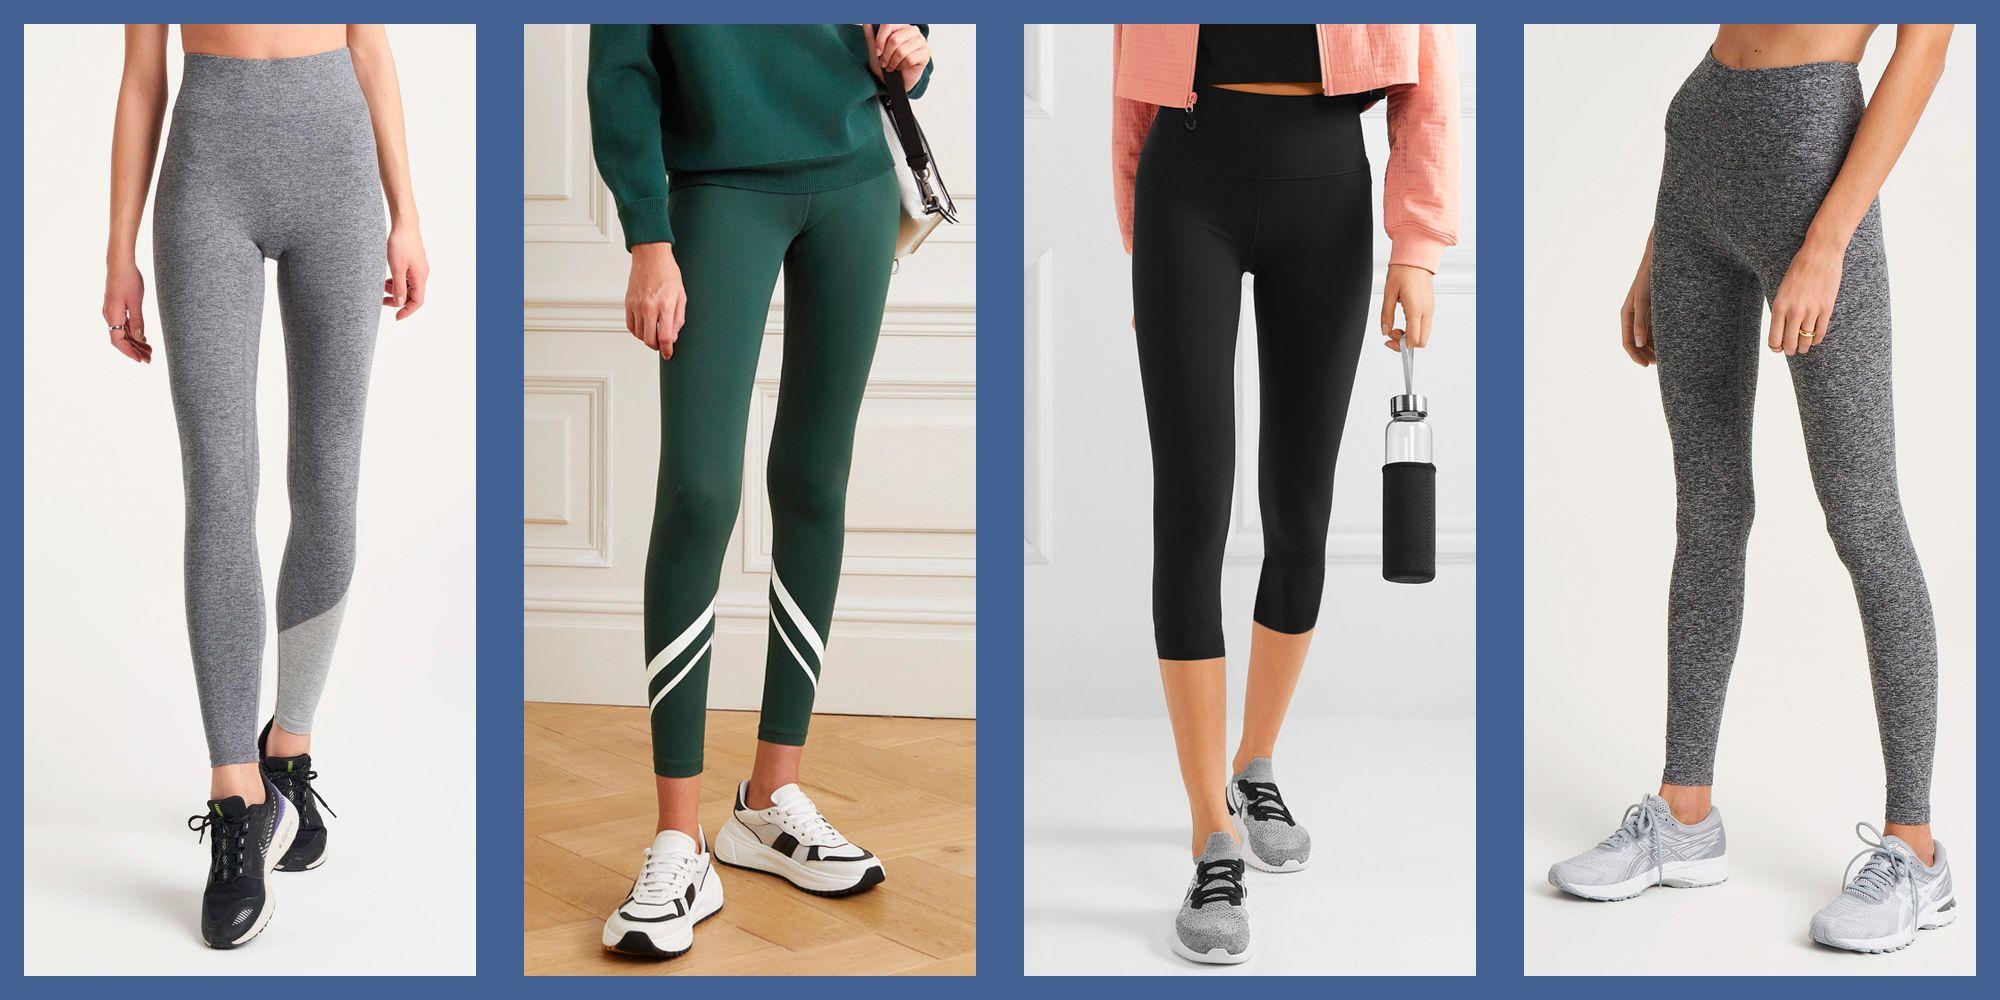 8 Most Flattering Pairs Of Leggings Stylish And Comfortable Leggings